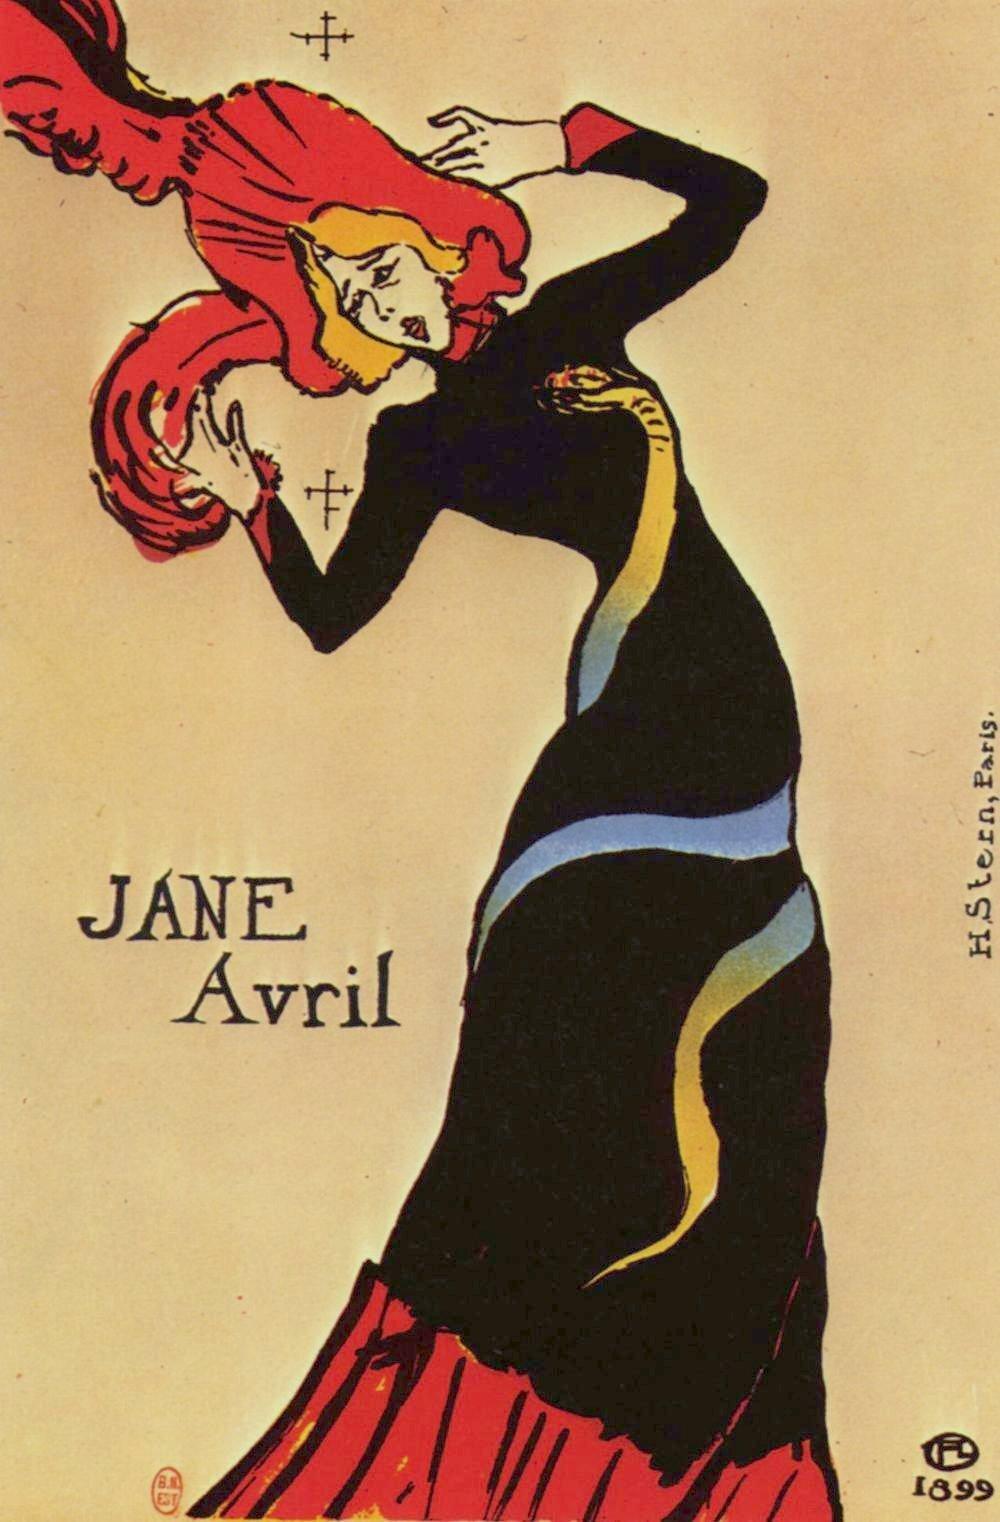 Jane Avril Ilustracja 3 Źródło: Henri Toulouse-Lautrec, Jane Avril, 1899, litografia barwna, domena publiczna.